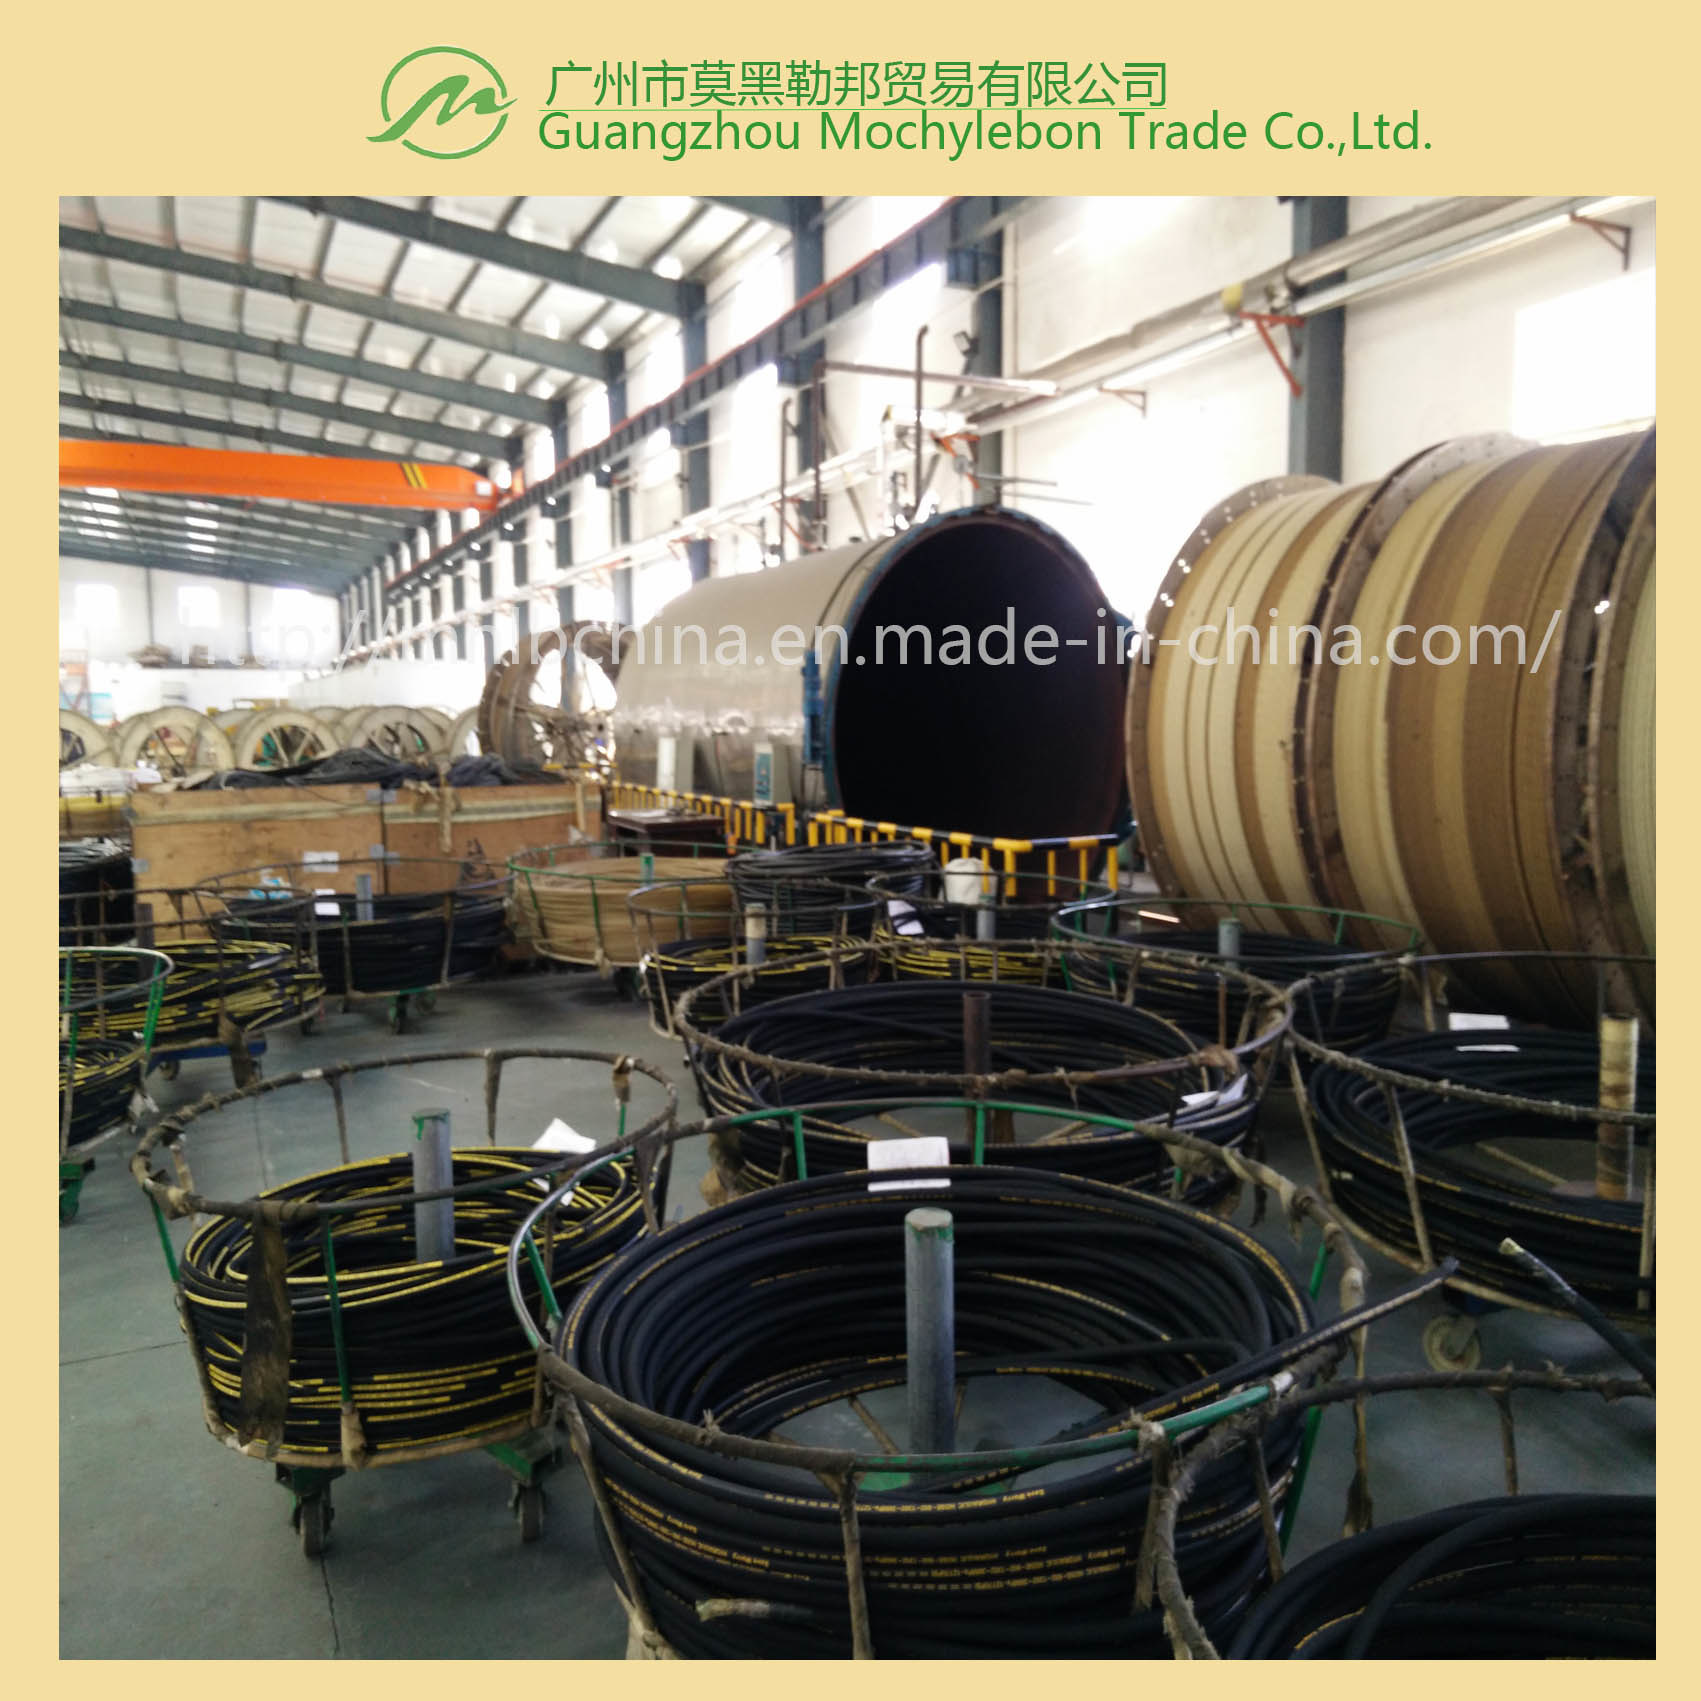 Steel Wire Hydraulic Hose&Hose Fittings